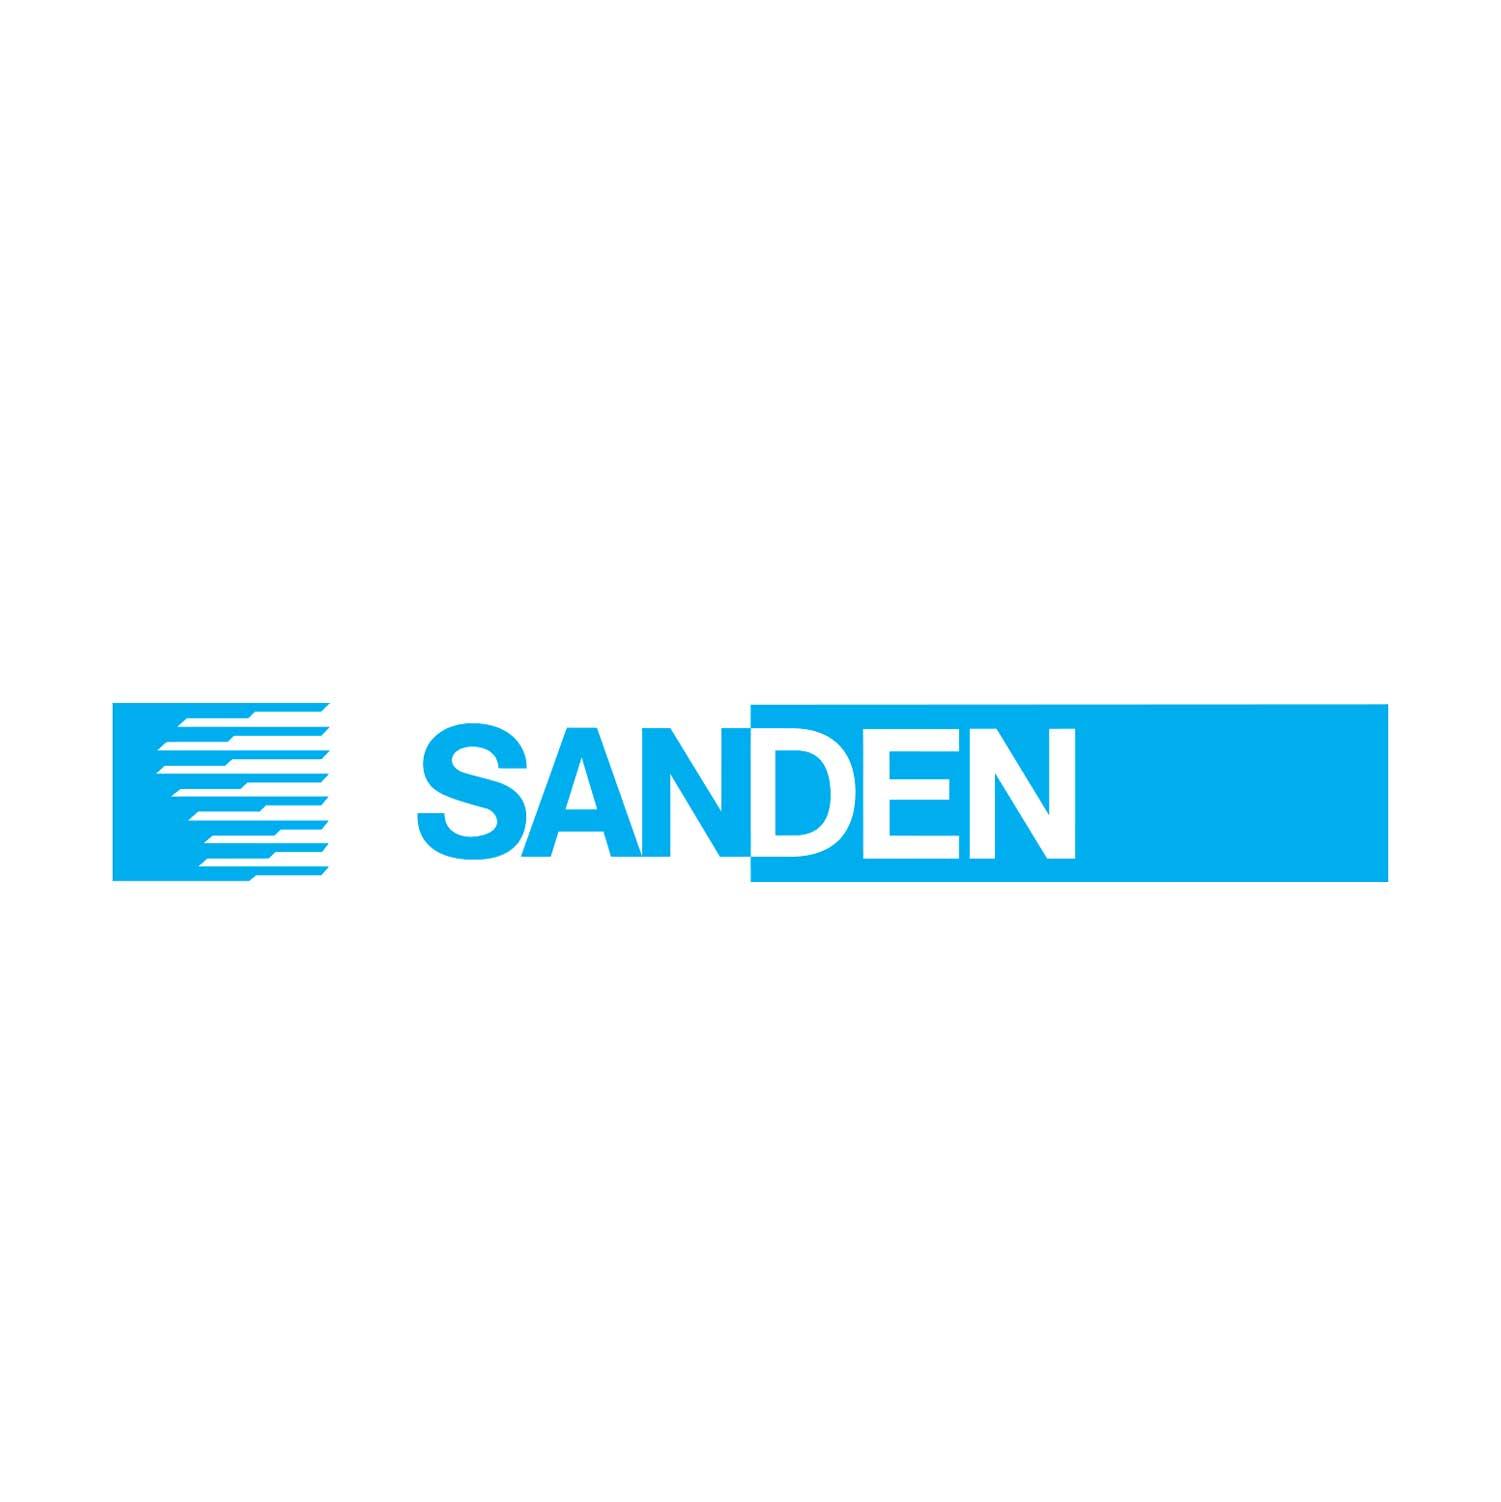 Sanden2_OV.jpg